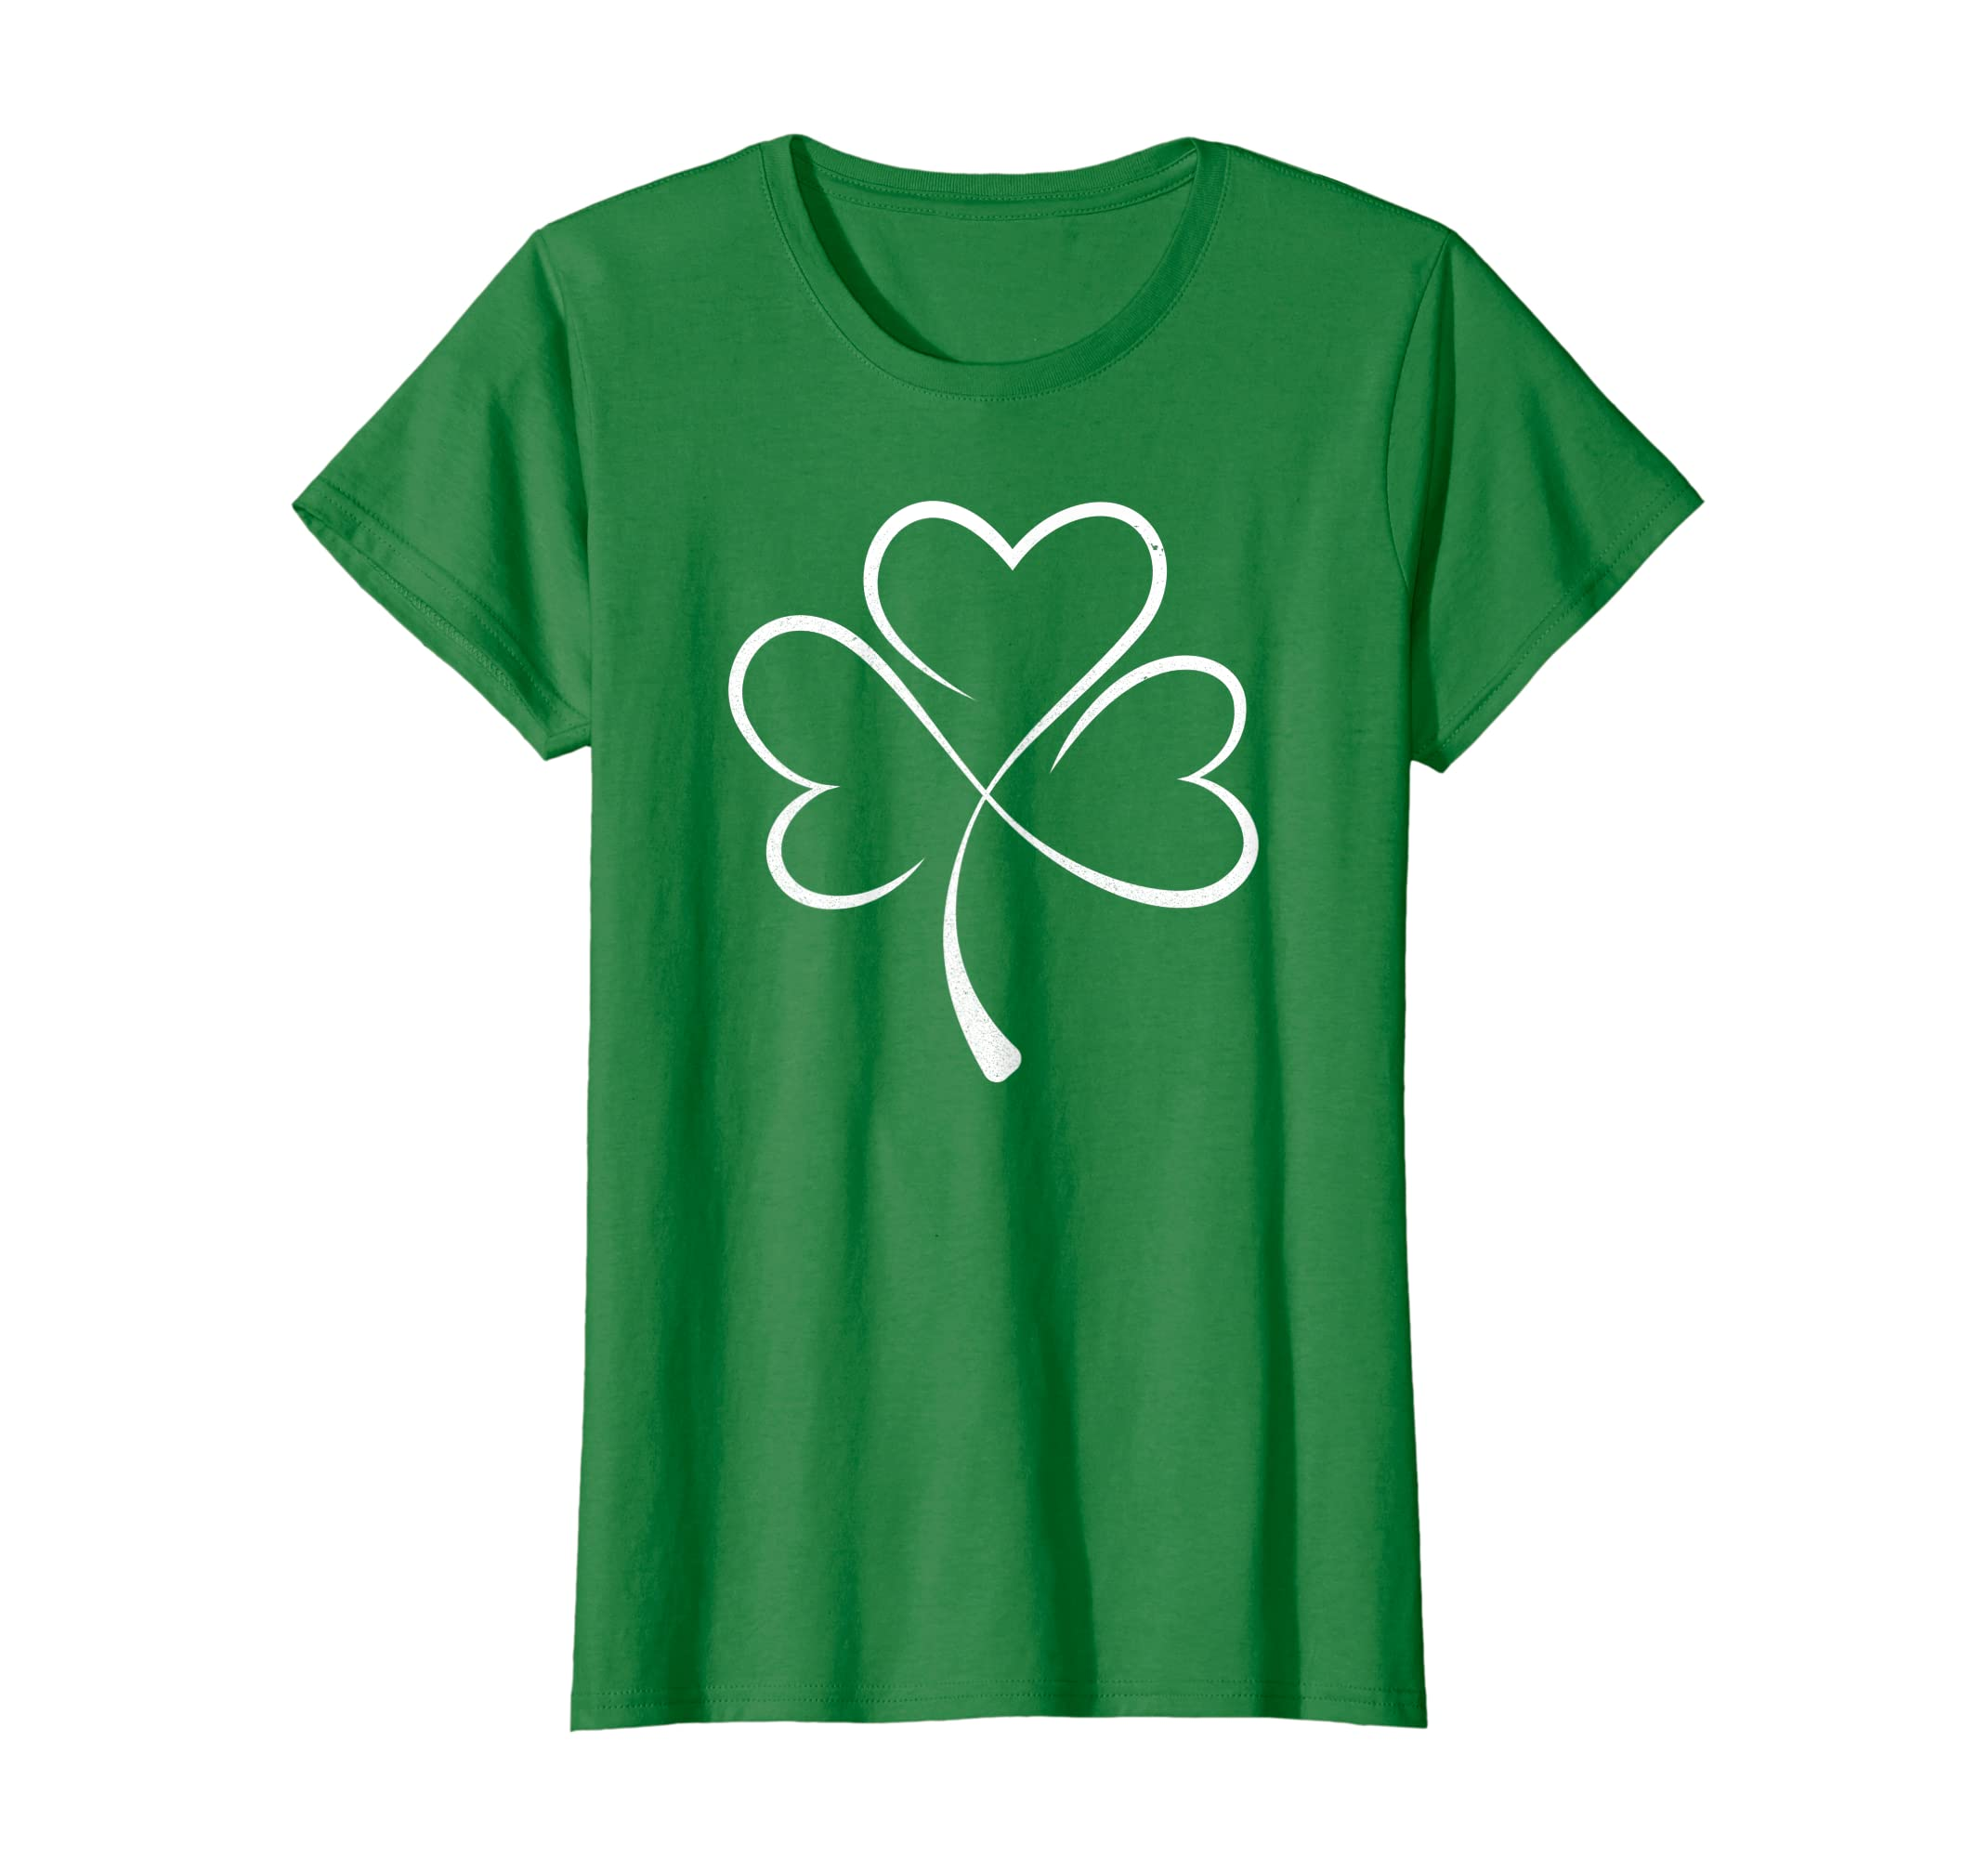 f57294069 Amazon.com: Classy Shamrock T-shirt Design for Saint Patricks Day: Clothing